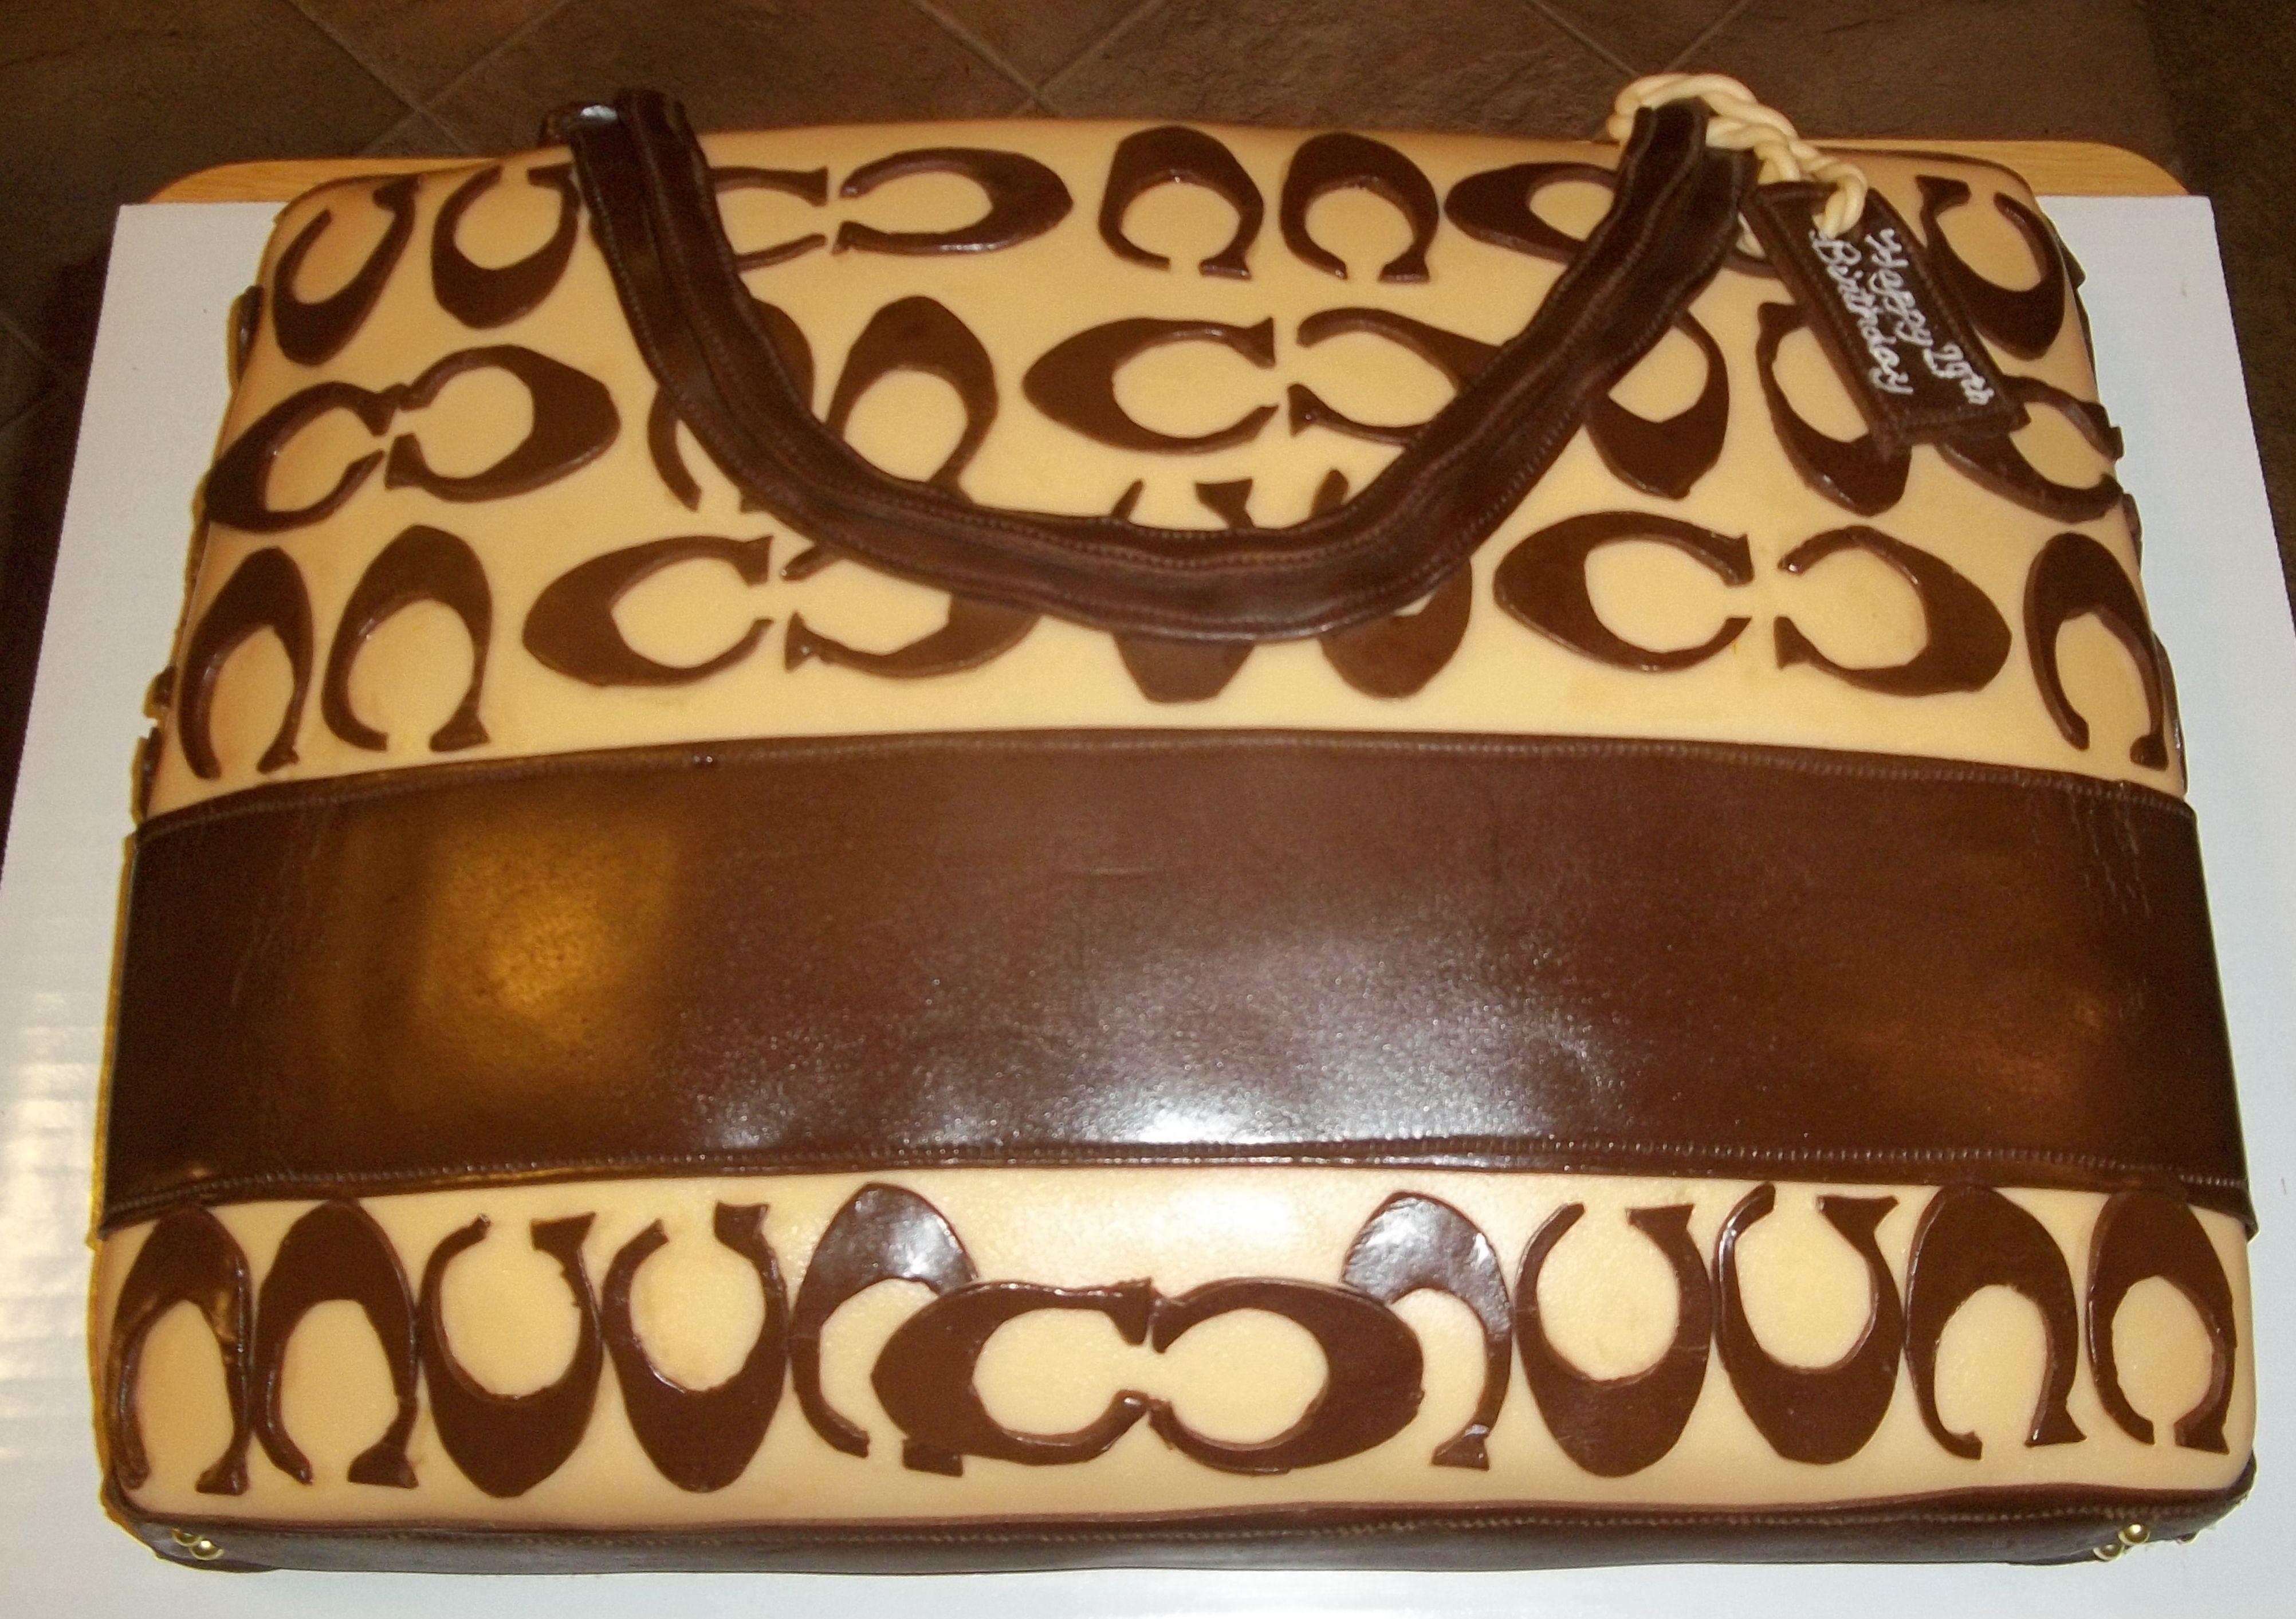 Coach Purse Birthday Cake Grandma Bettys Bakery Delights